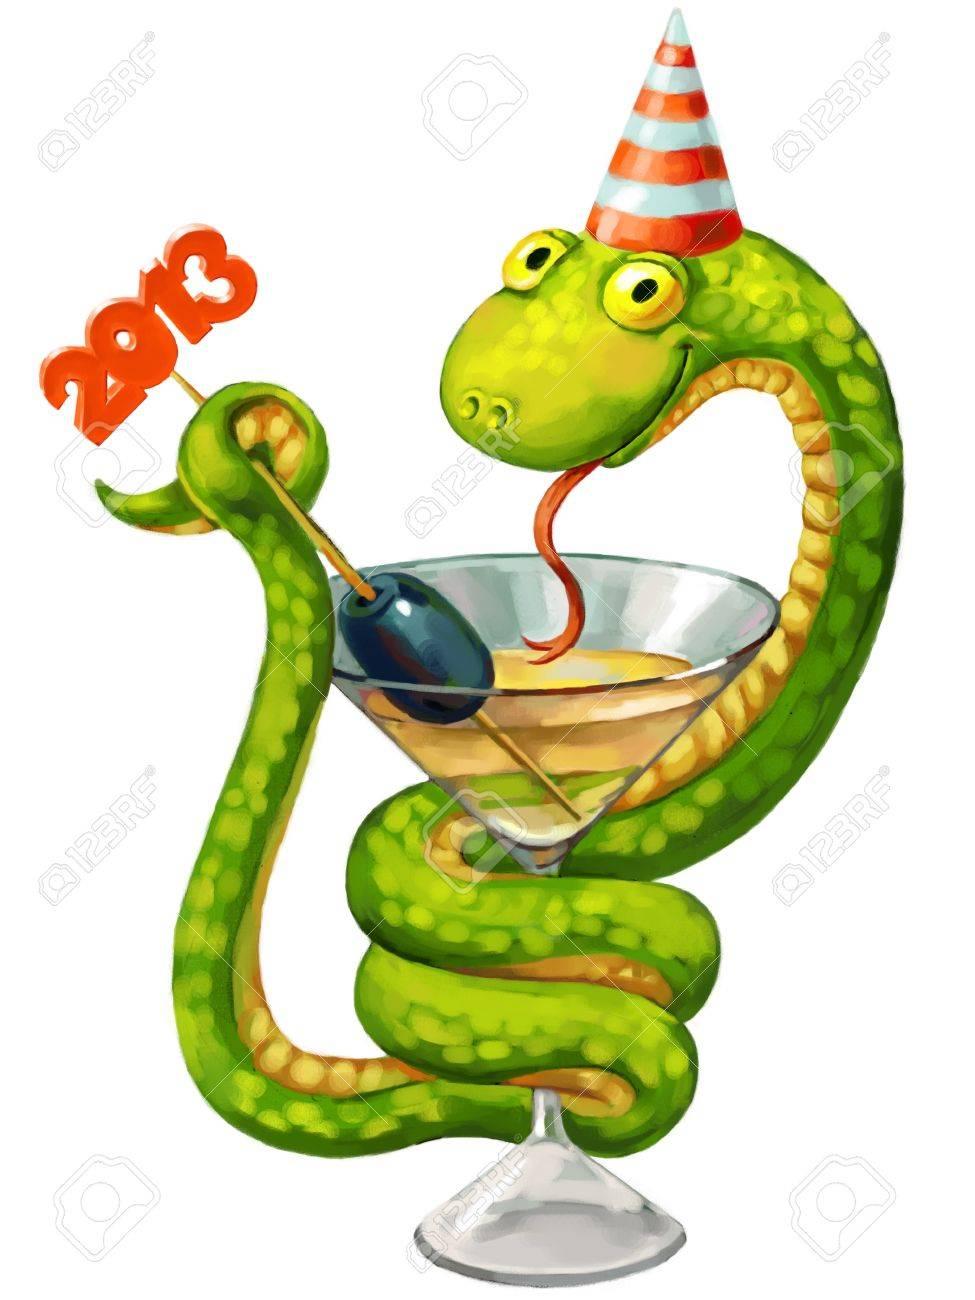 Cute snake, symbol of 2013 year, Hand-drawn Stock Photo - 16650578